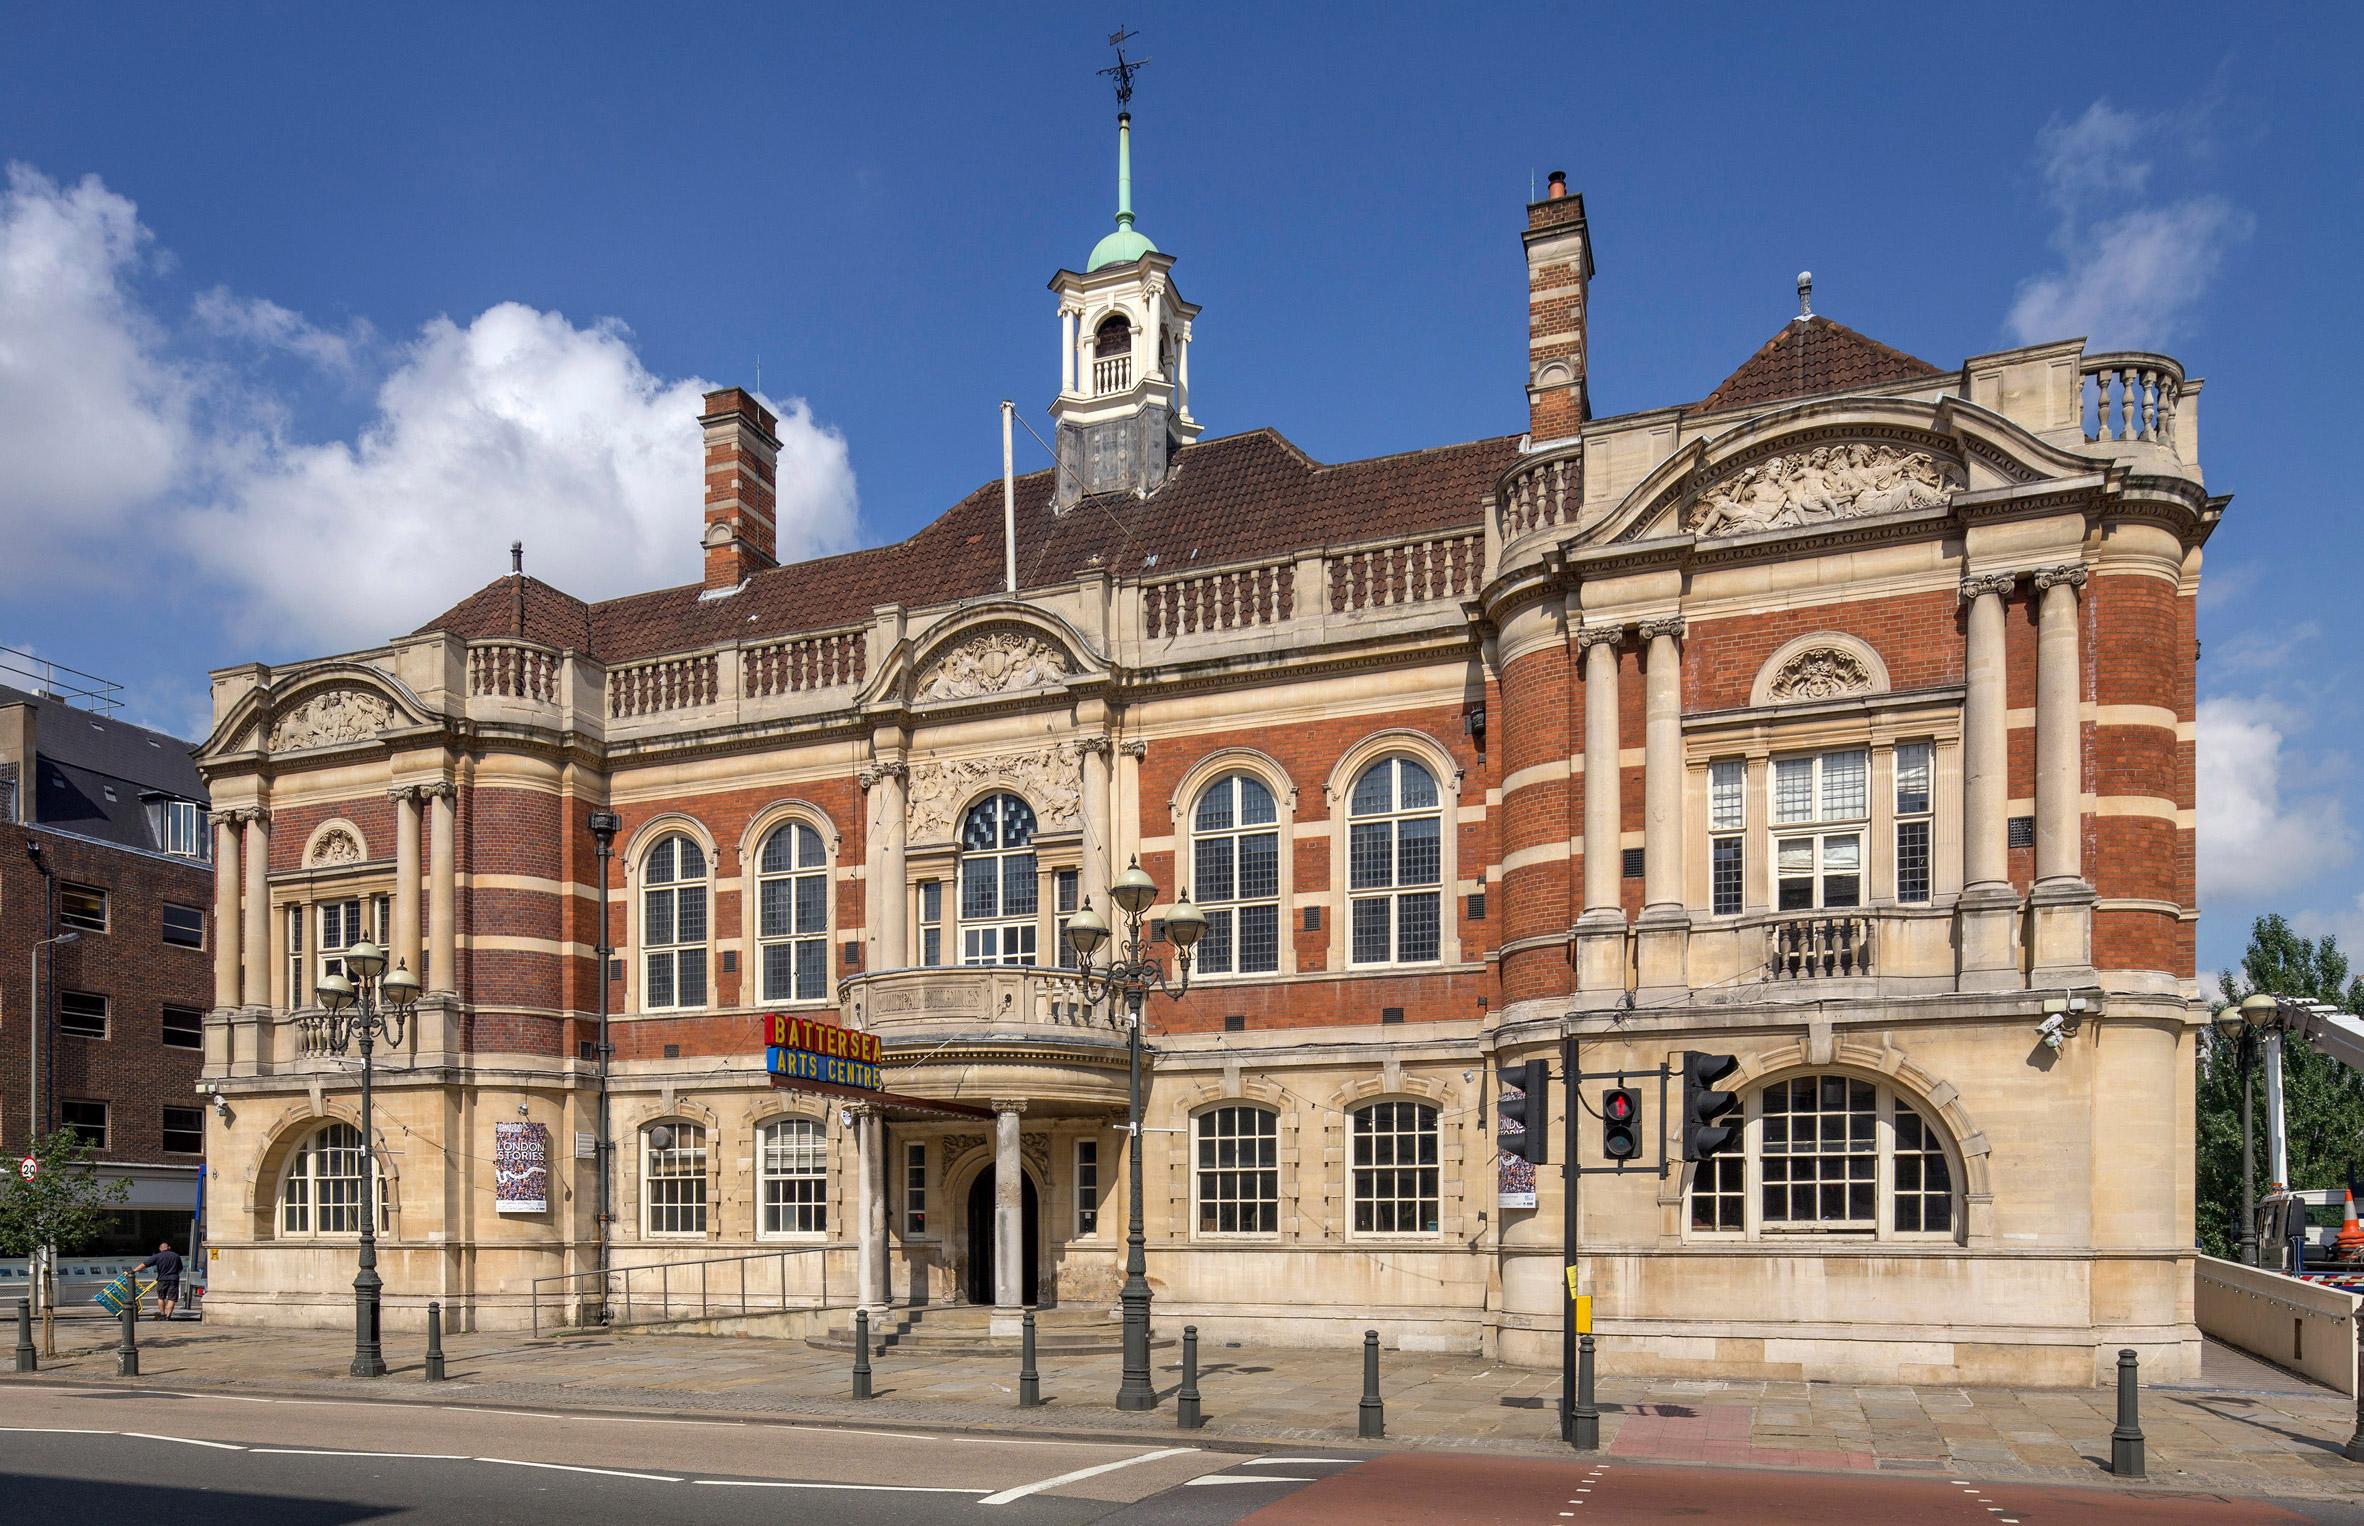 Battersea Arts Centre by Haworth Tompkins